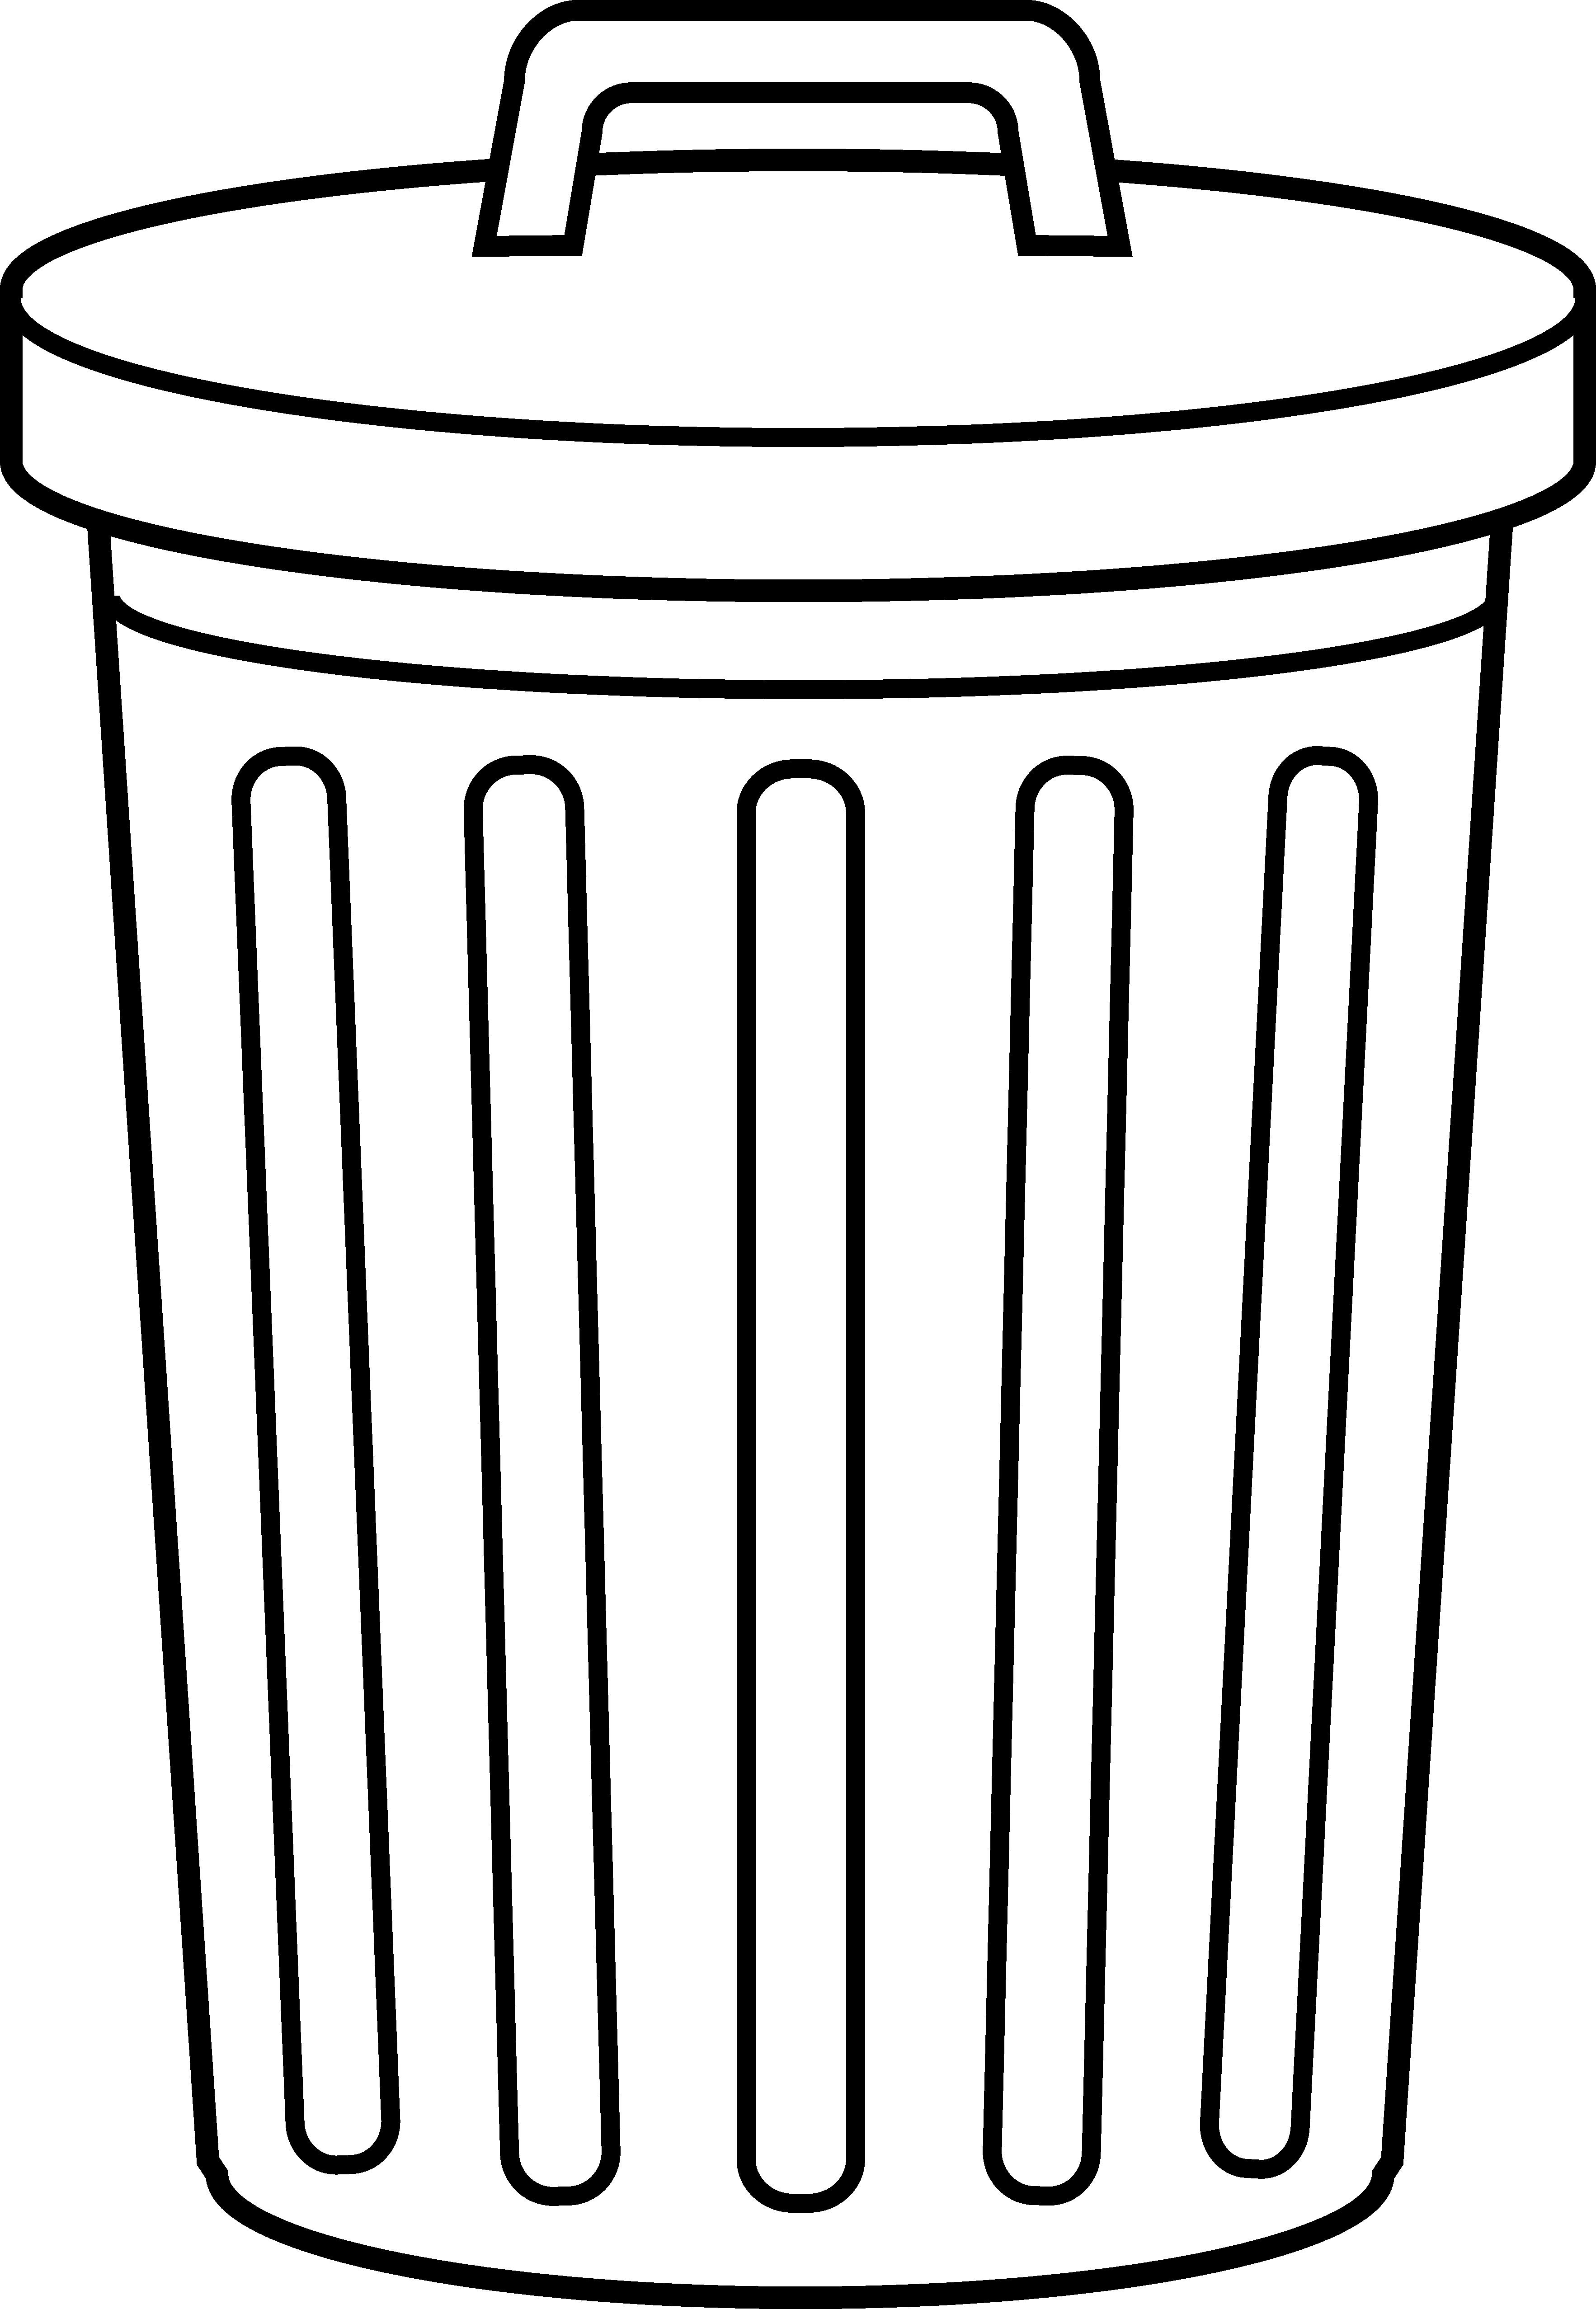 Garbage Can Line Art - Free .-Garbage Can Line Art - Free .-7